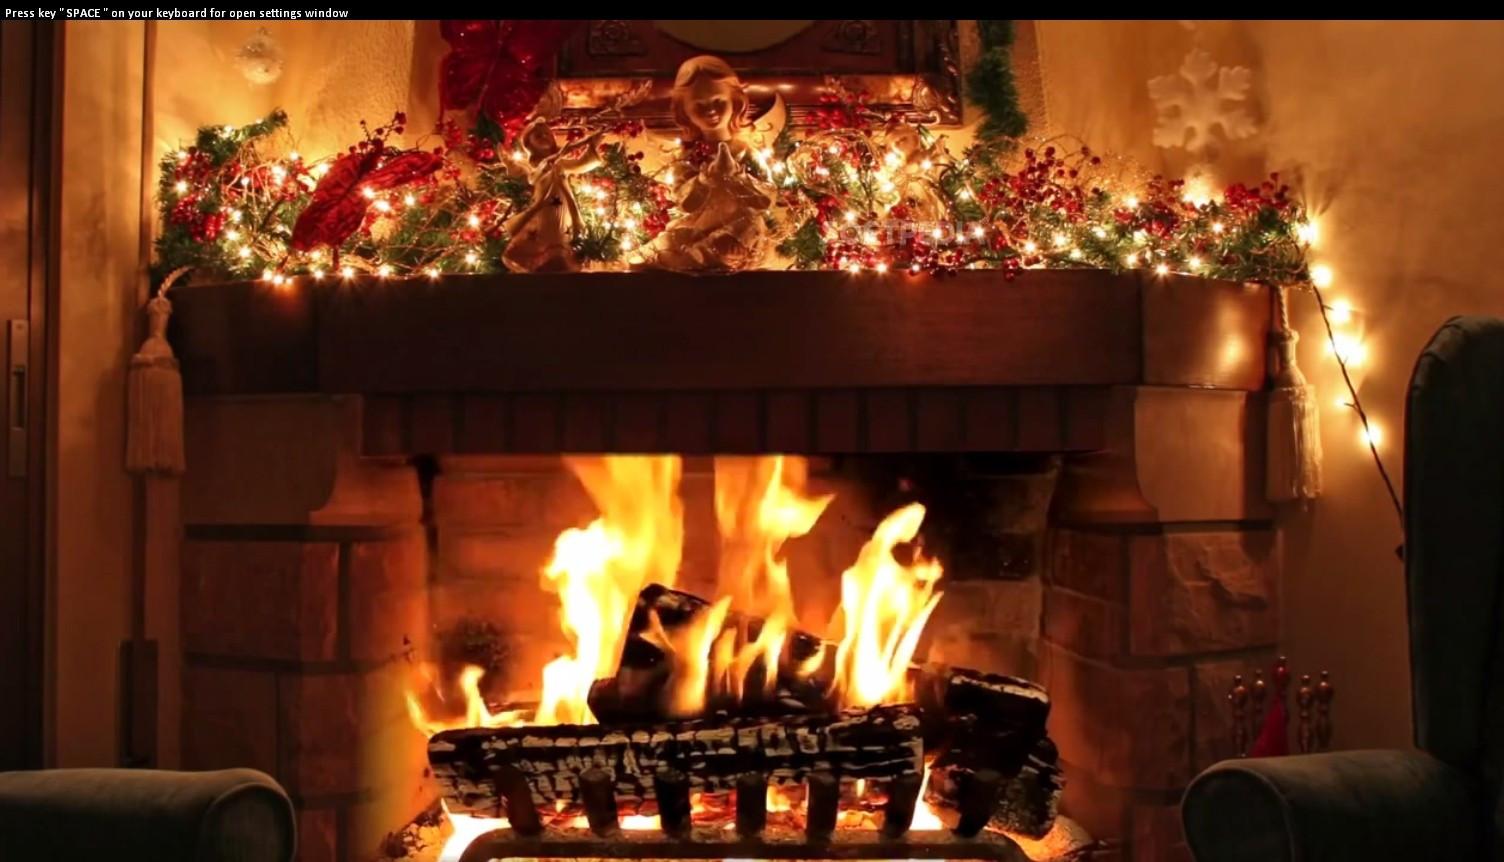 Christmas Fireplace Screensaver  Best Games Pc Freeware free programs drumdevelopers